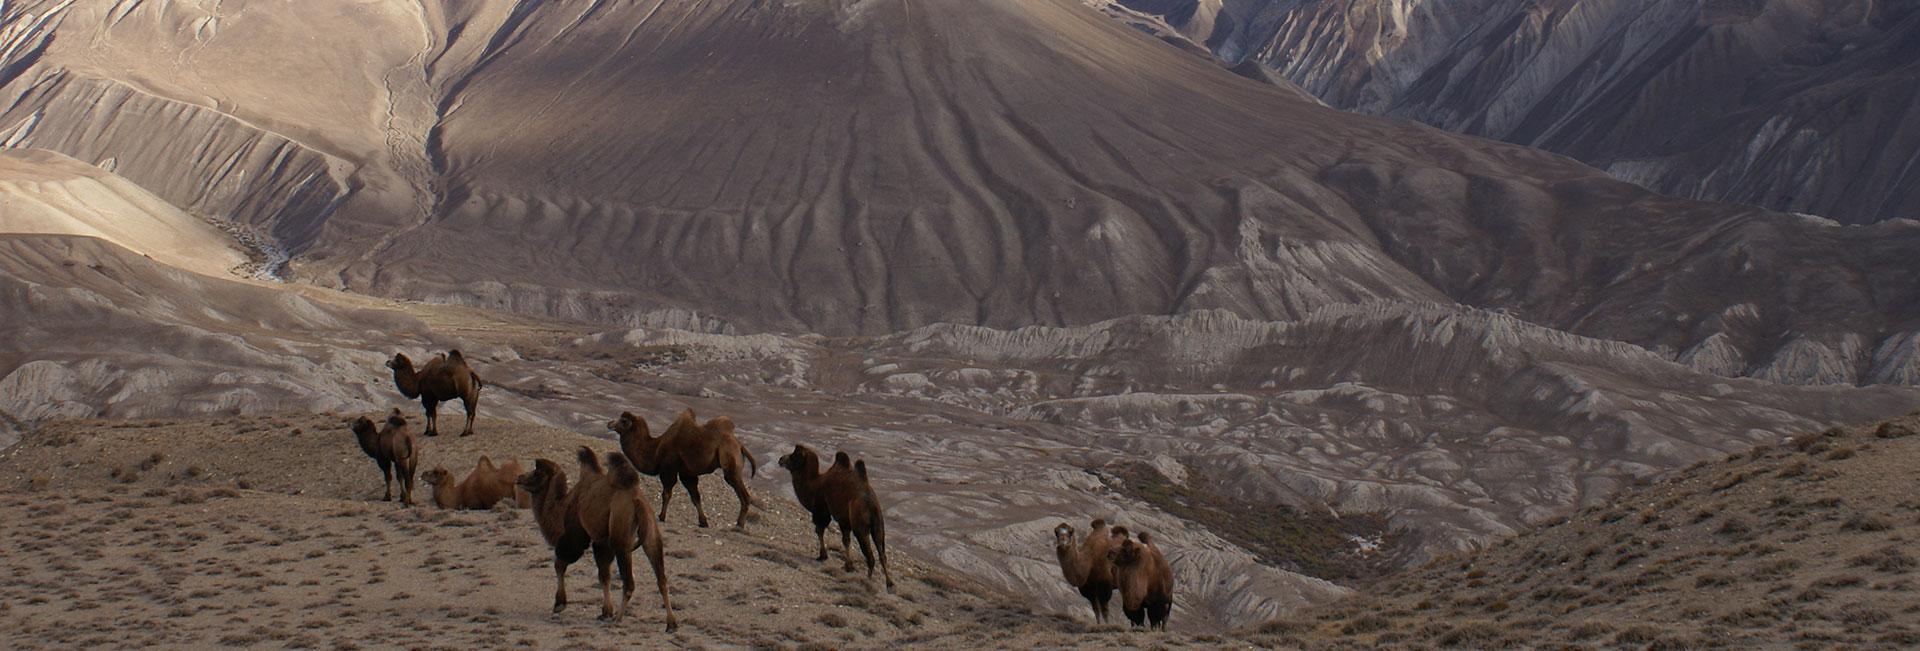 Camels in Wakhan Valley (Tajikistan). Photo credit: Dilshod Karimov